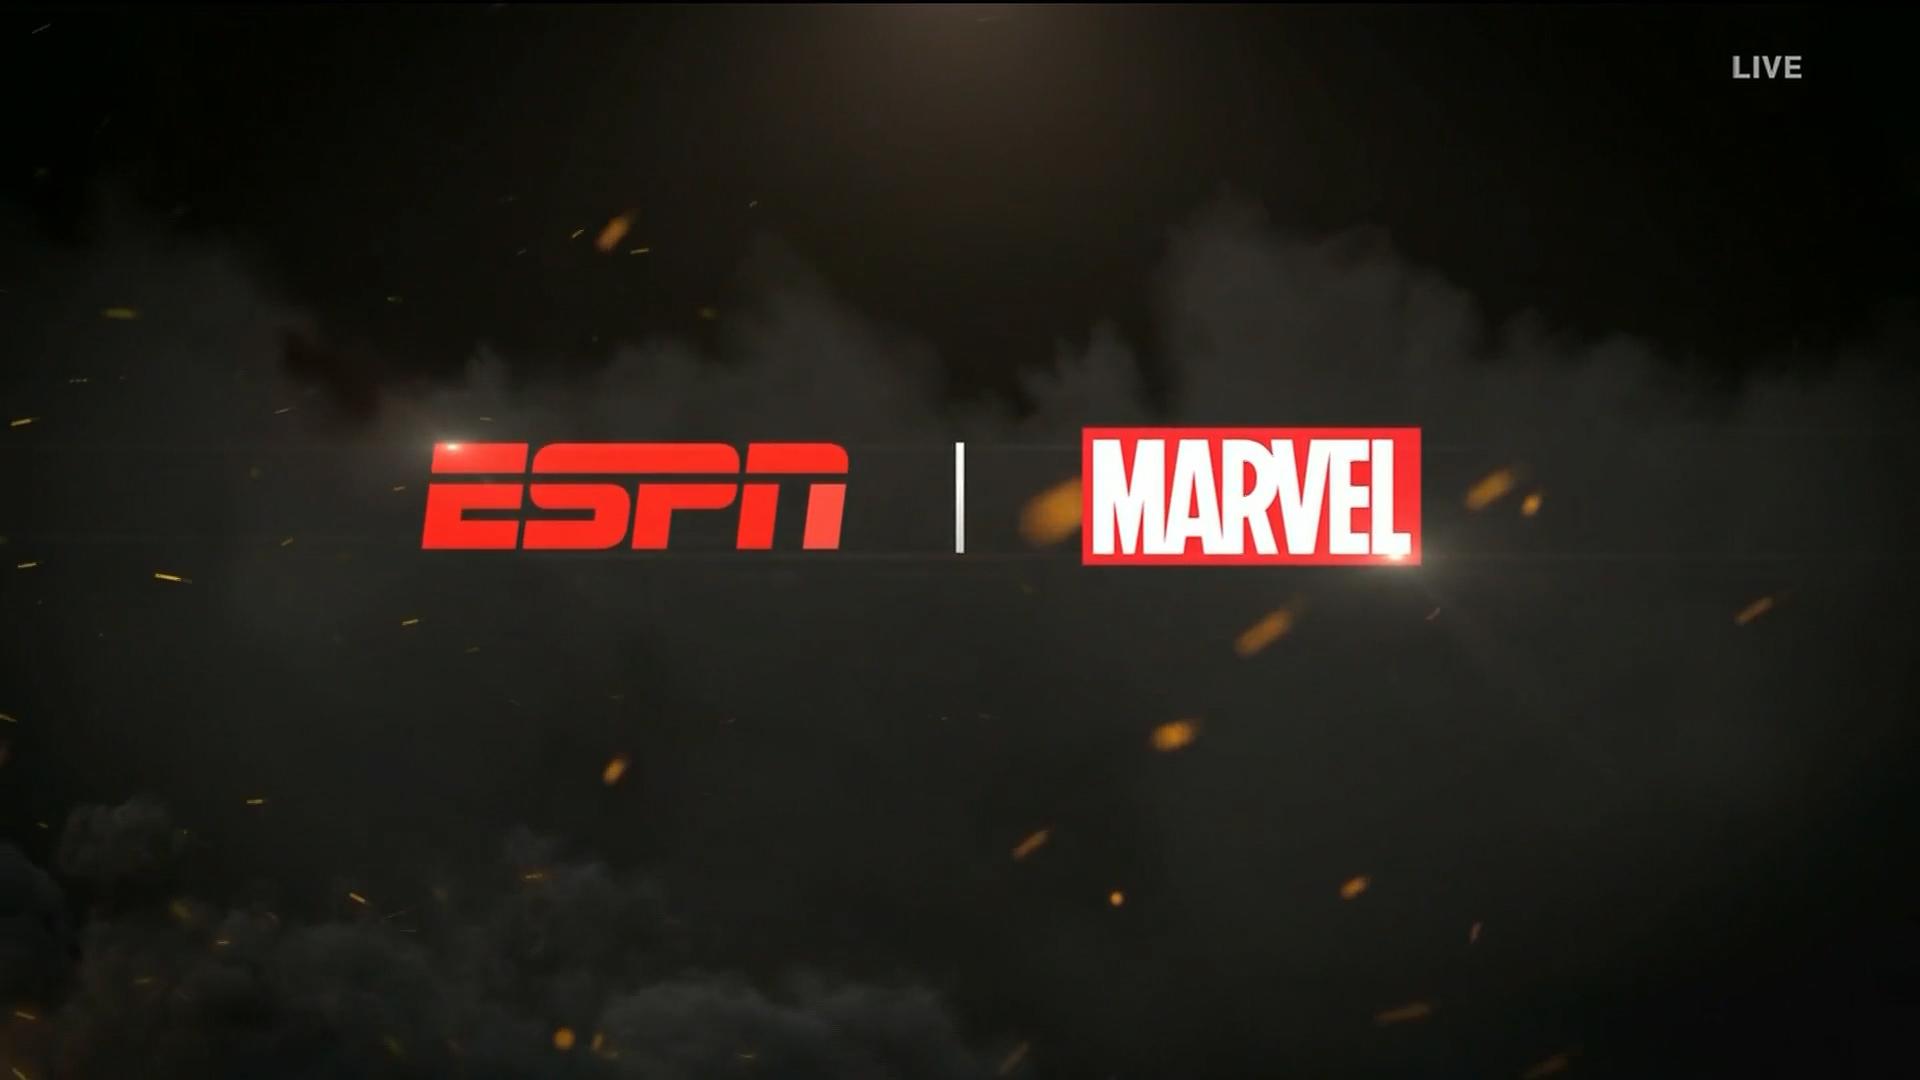 ESPN MARVEL 1